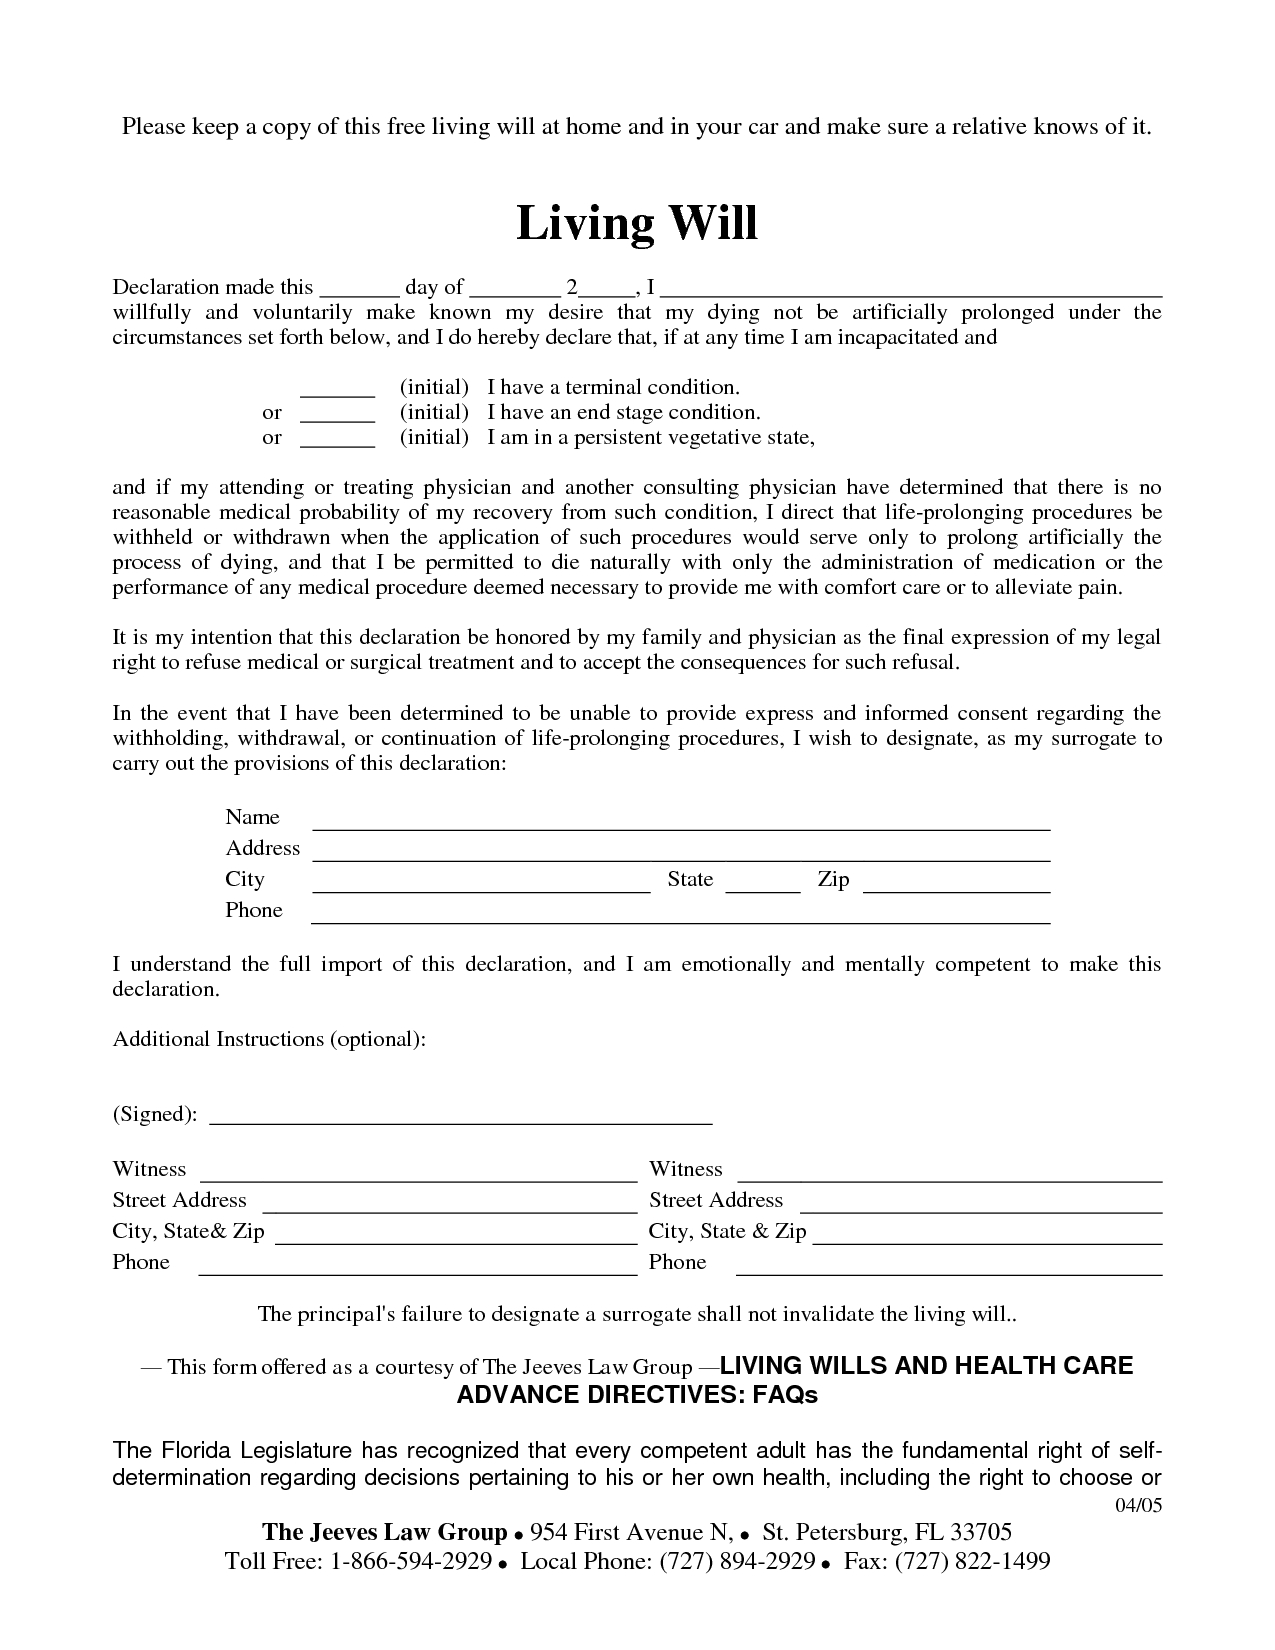 Free Copy Of Living Willrichard_Cataman - Living Will Sample - Free Printable Wills